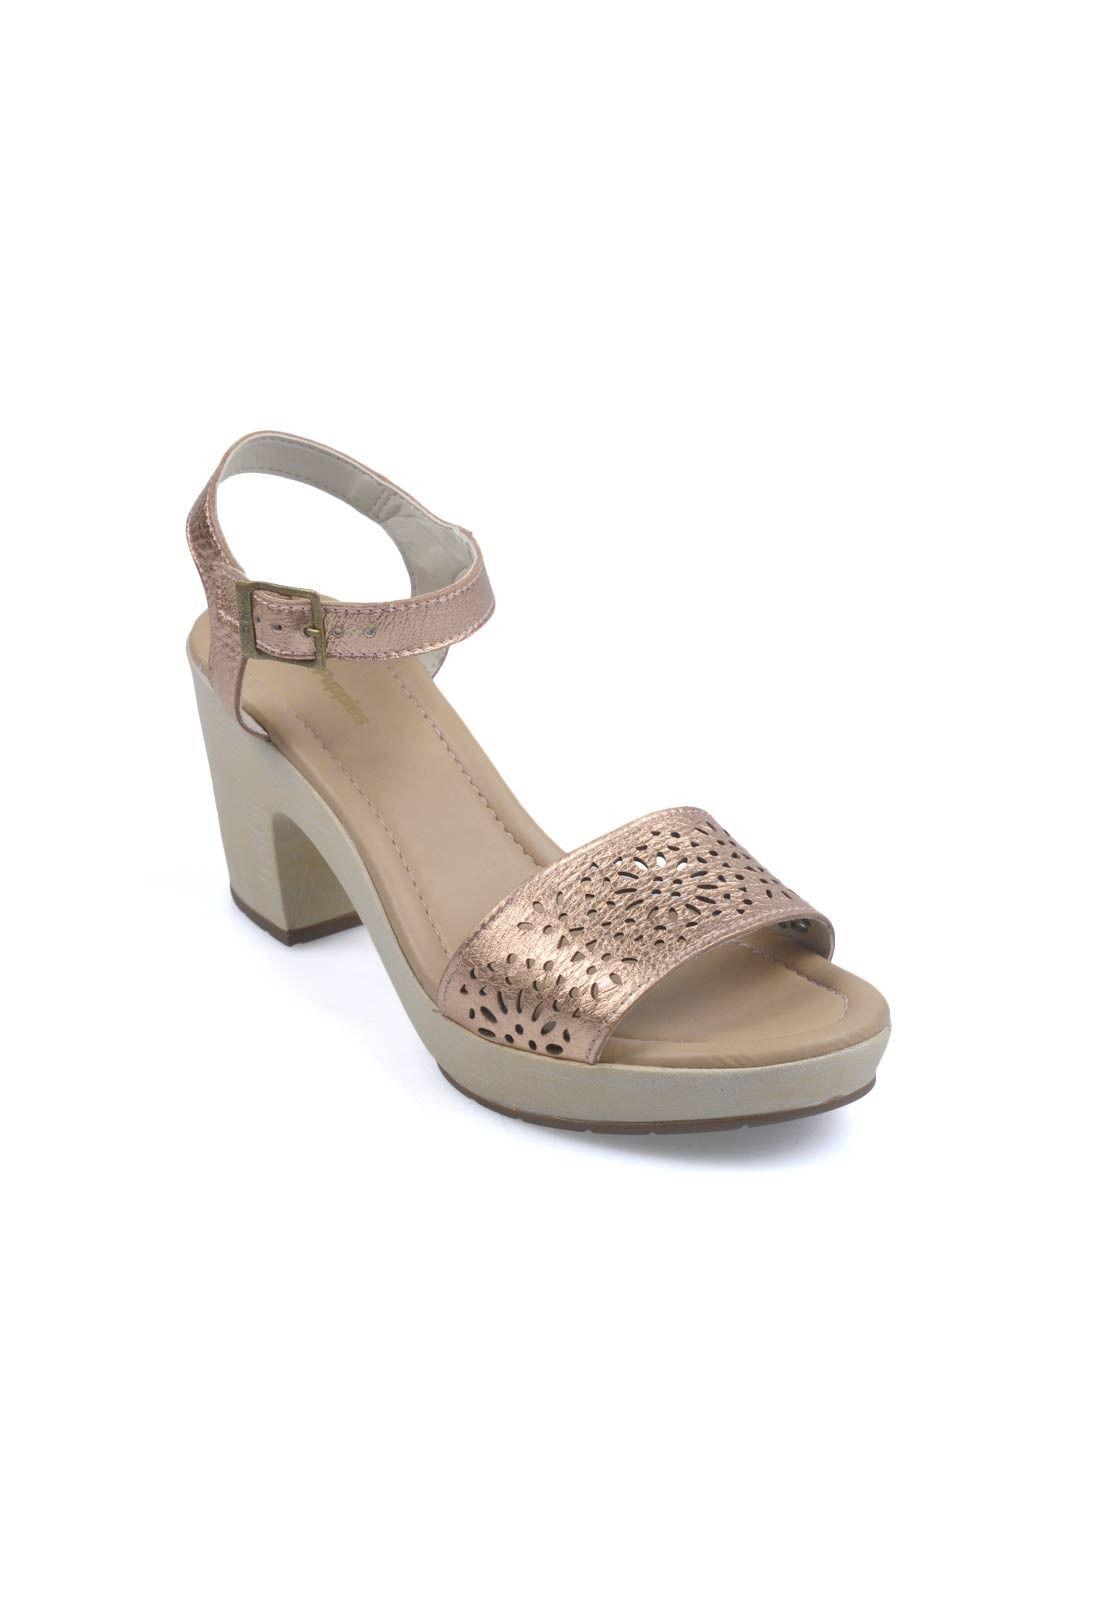 Sandalia Cobre Hush Puppies Batak Sandalias Mujer Hush Puppies Zapatos Crocs Sandalias